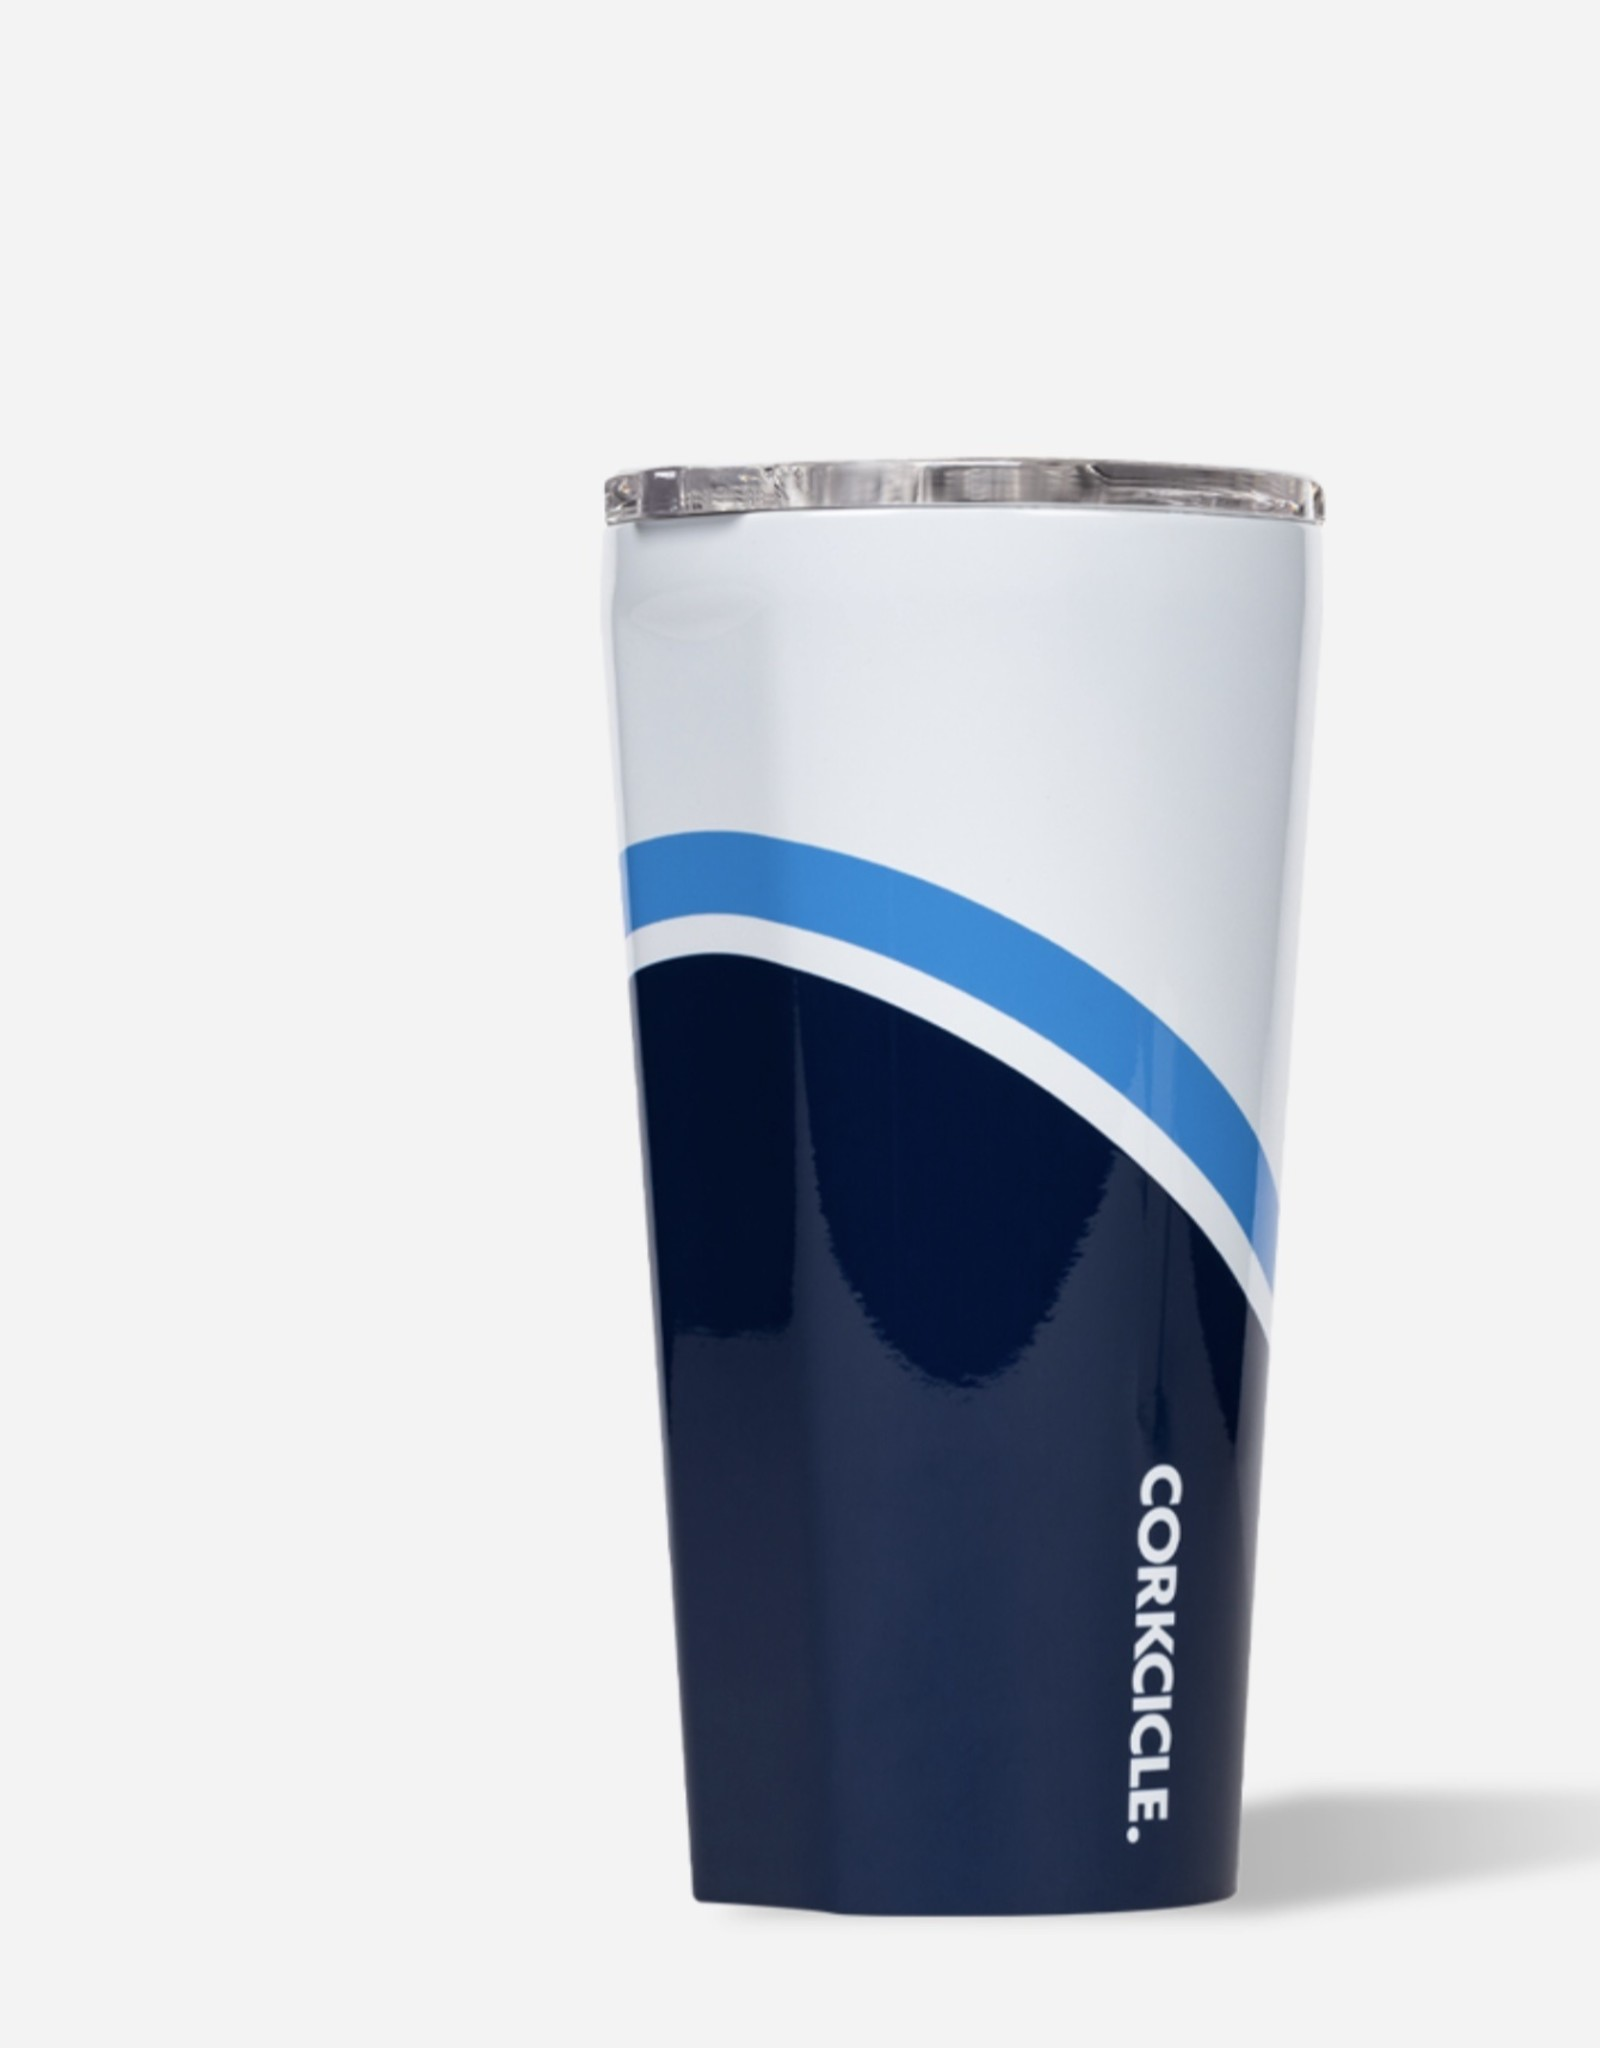 Corkcicle Corkcicle - 16oz Tumbler Regatta Blue